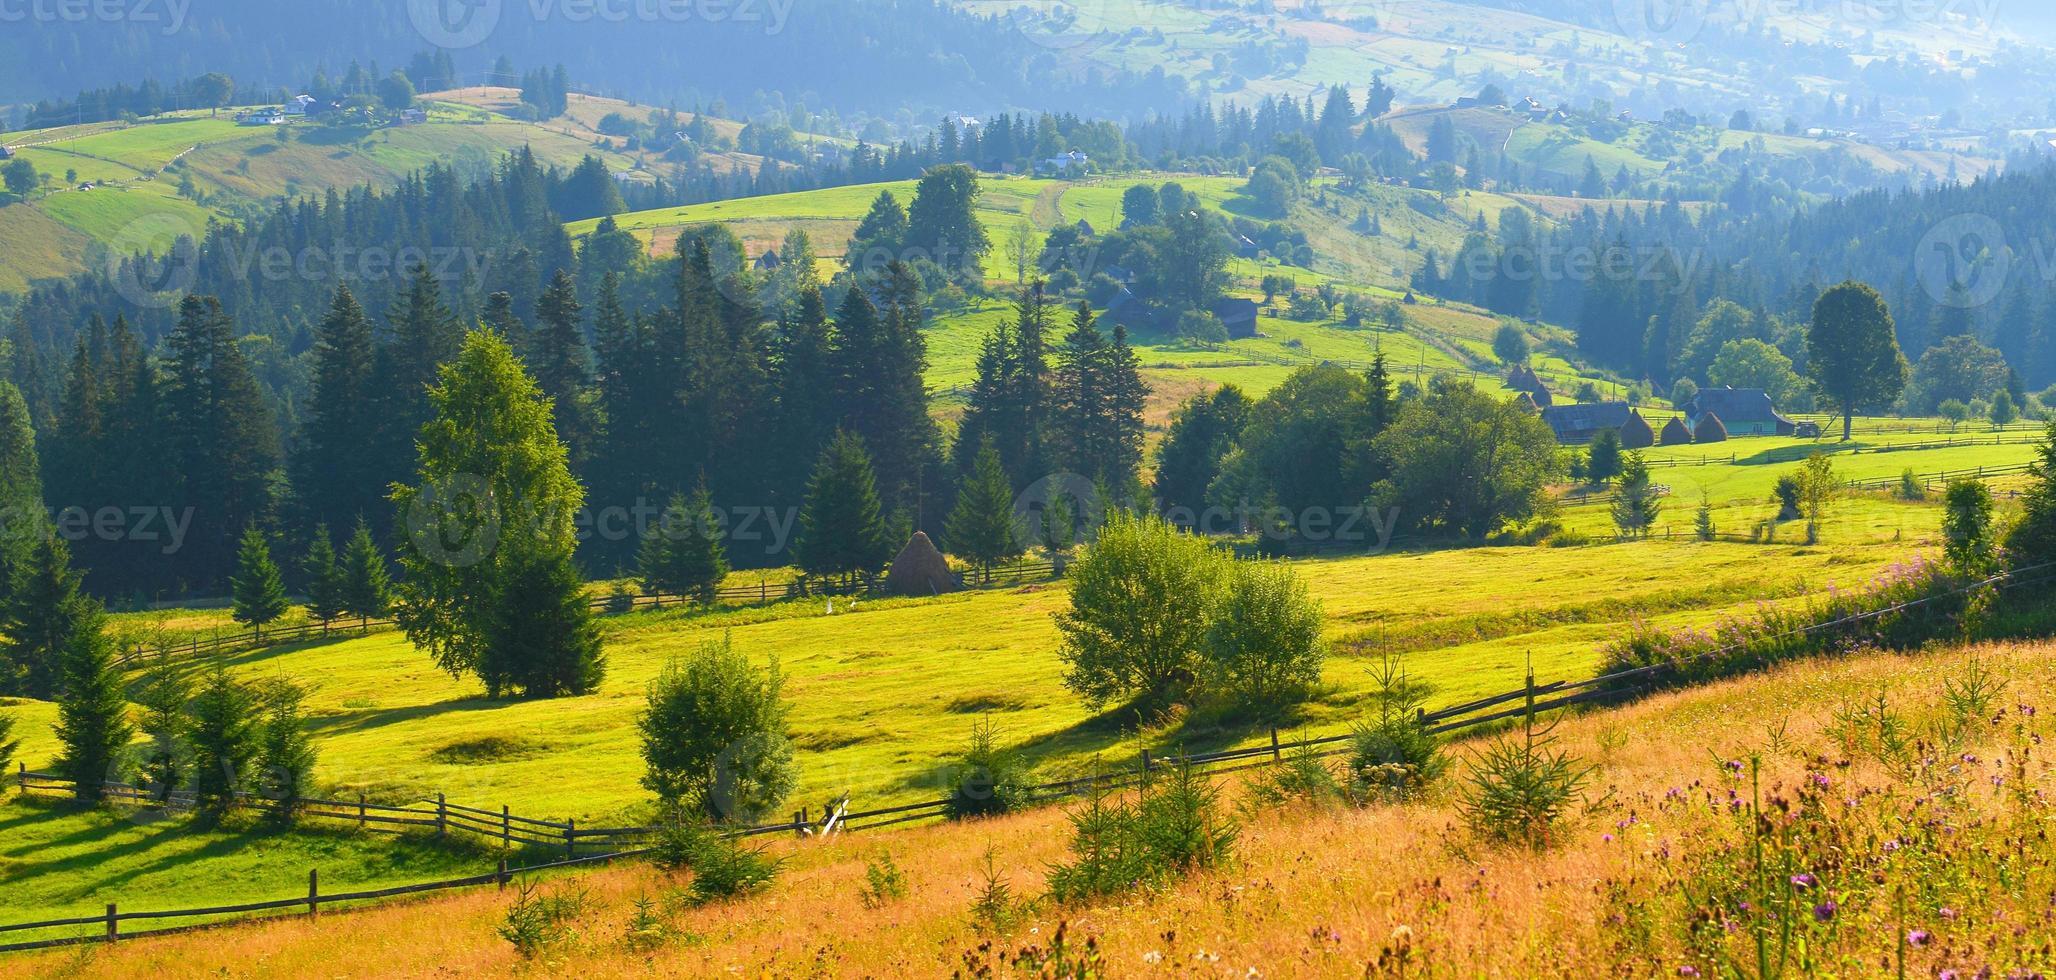 zomer platteland foto